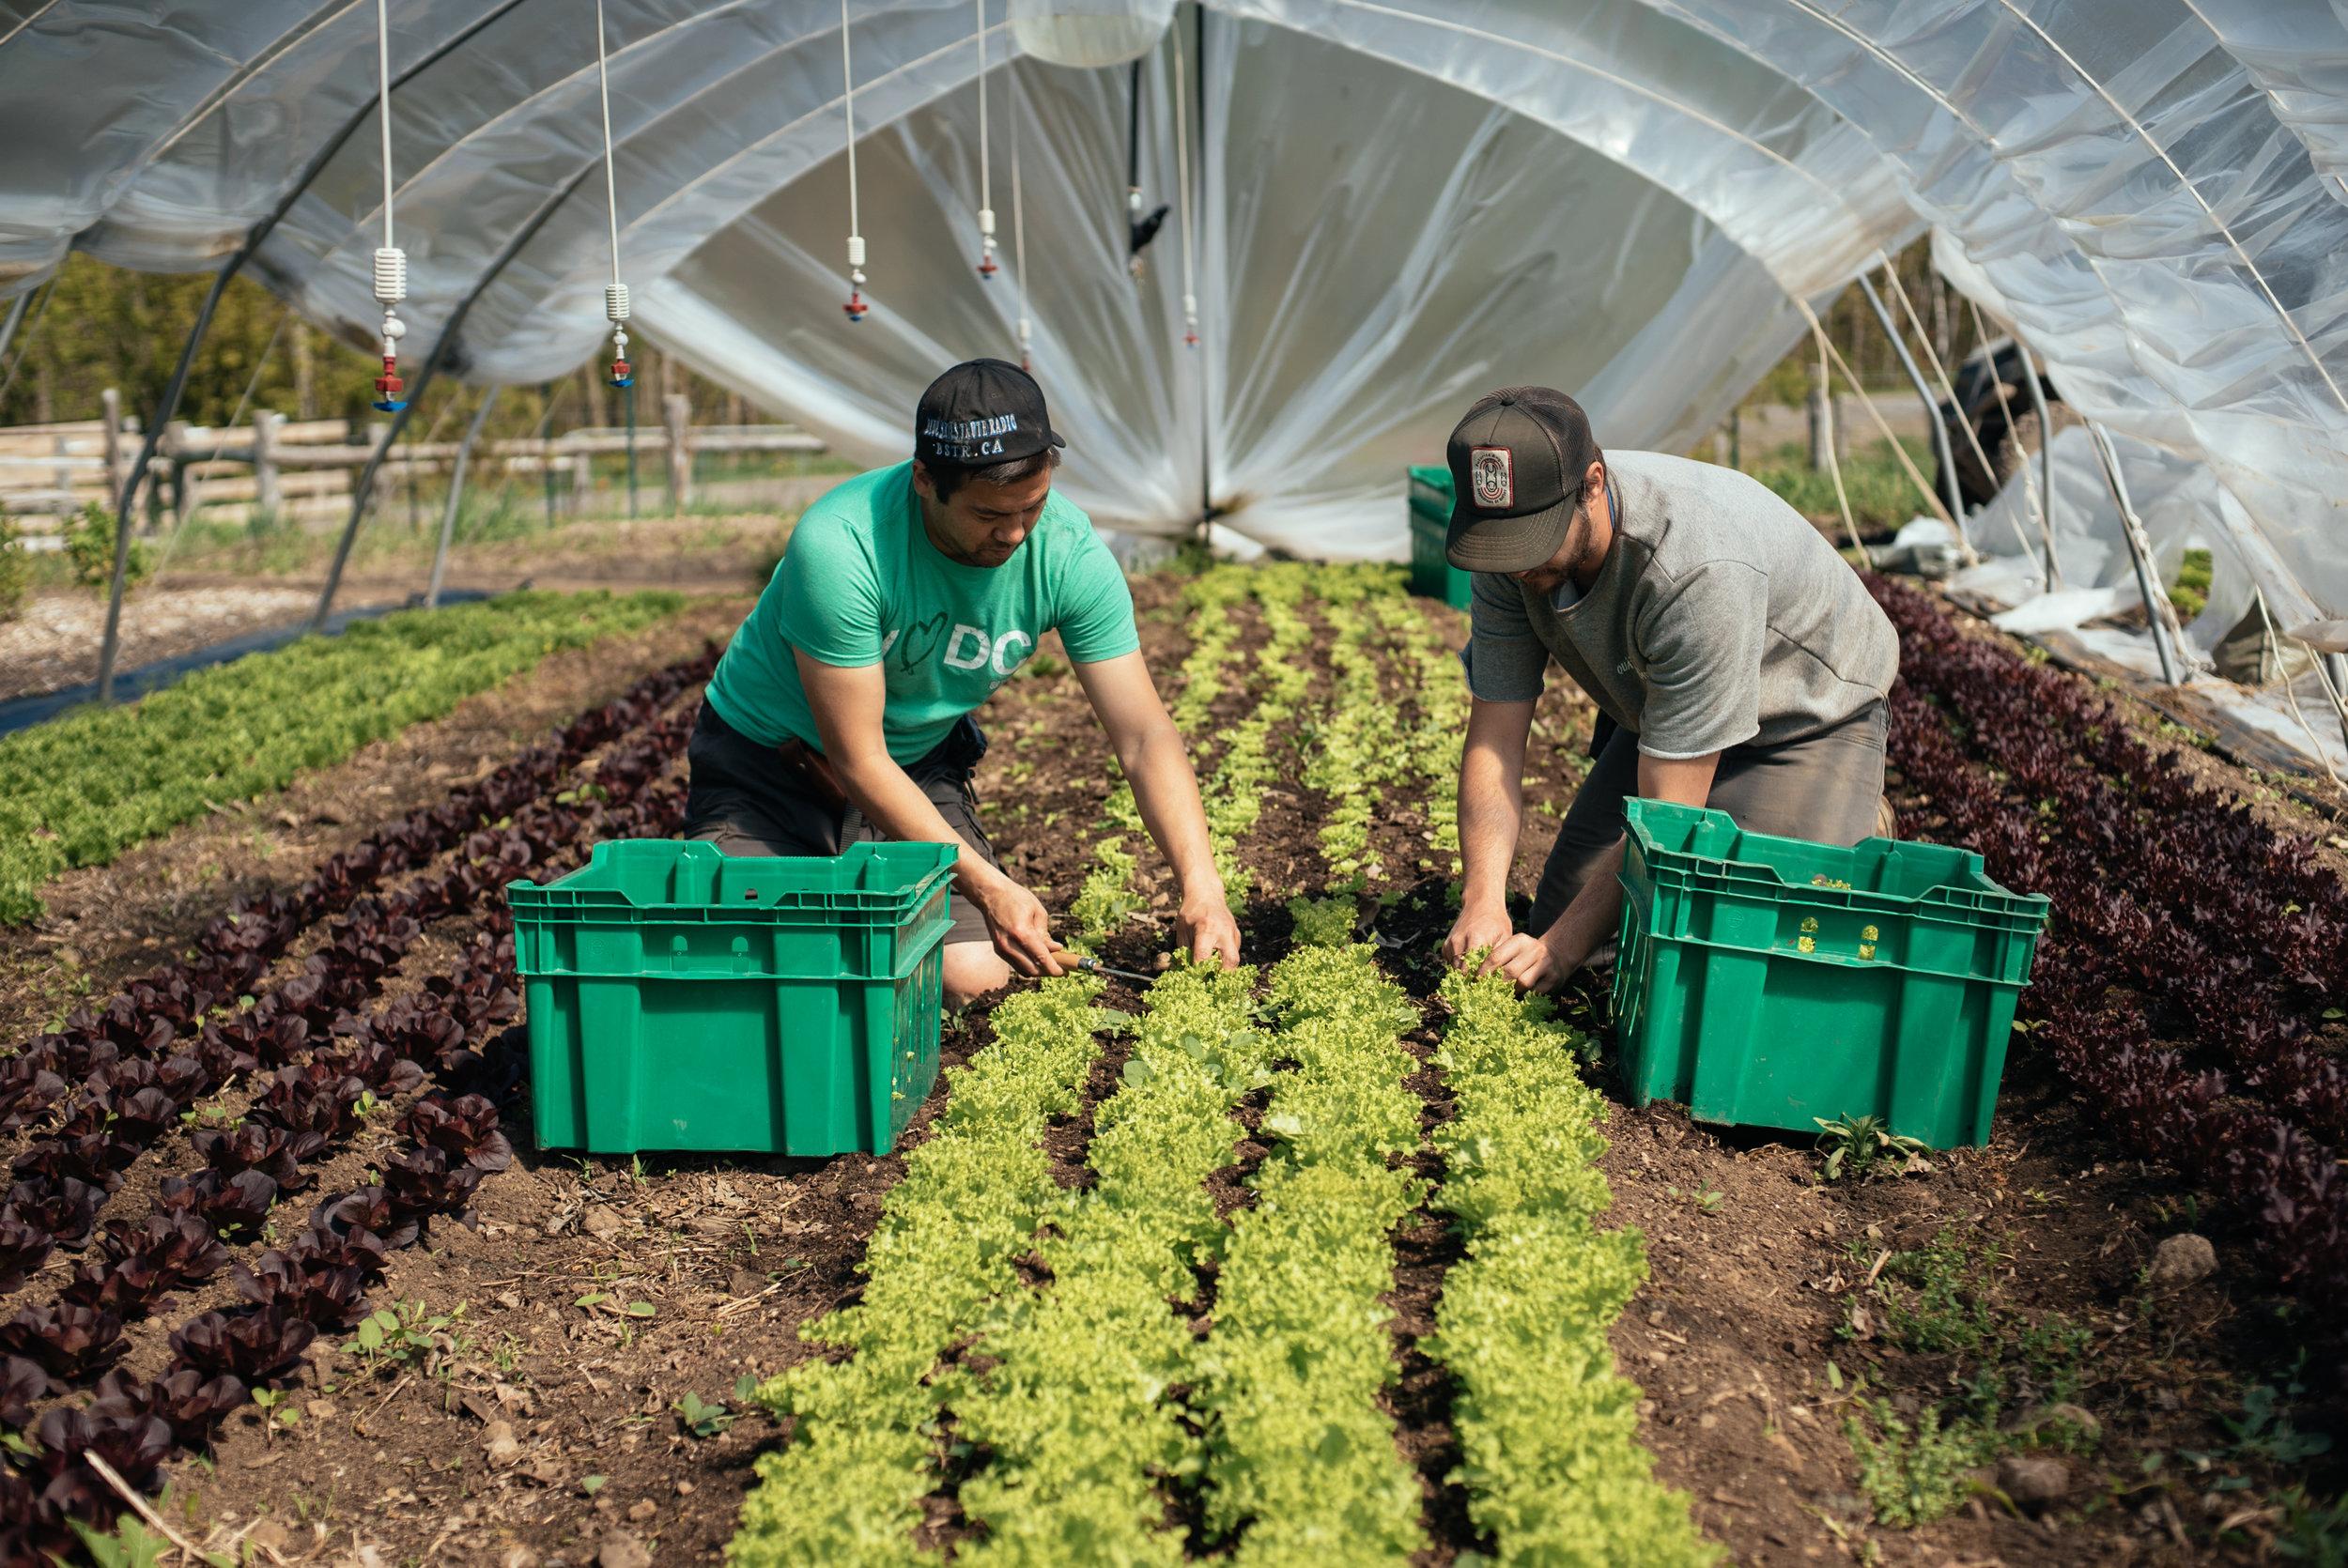 Etonnant Seattle Area, WA | 2 Day Training, Market Gardening 2.0 U2014 The Market  Gardener